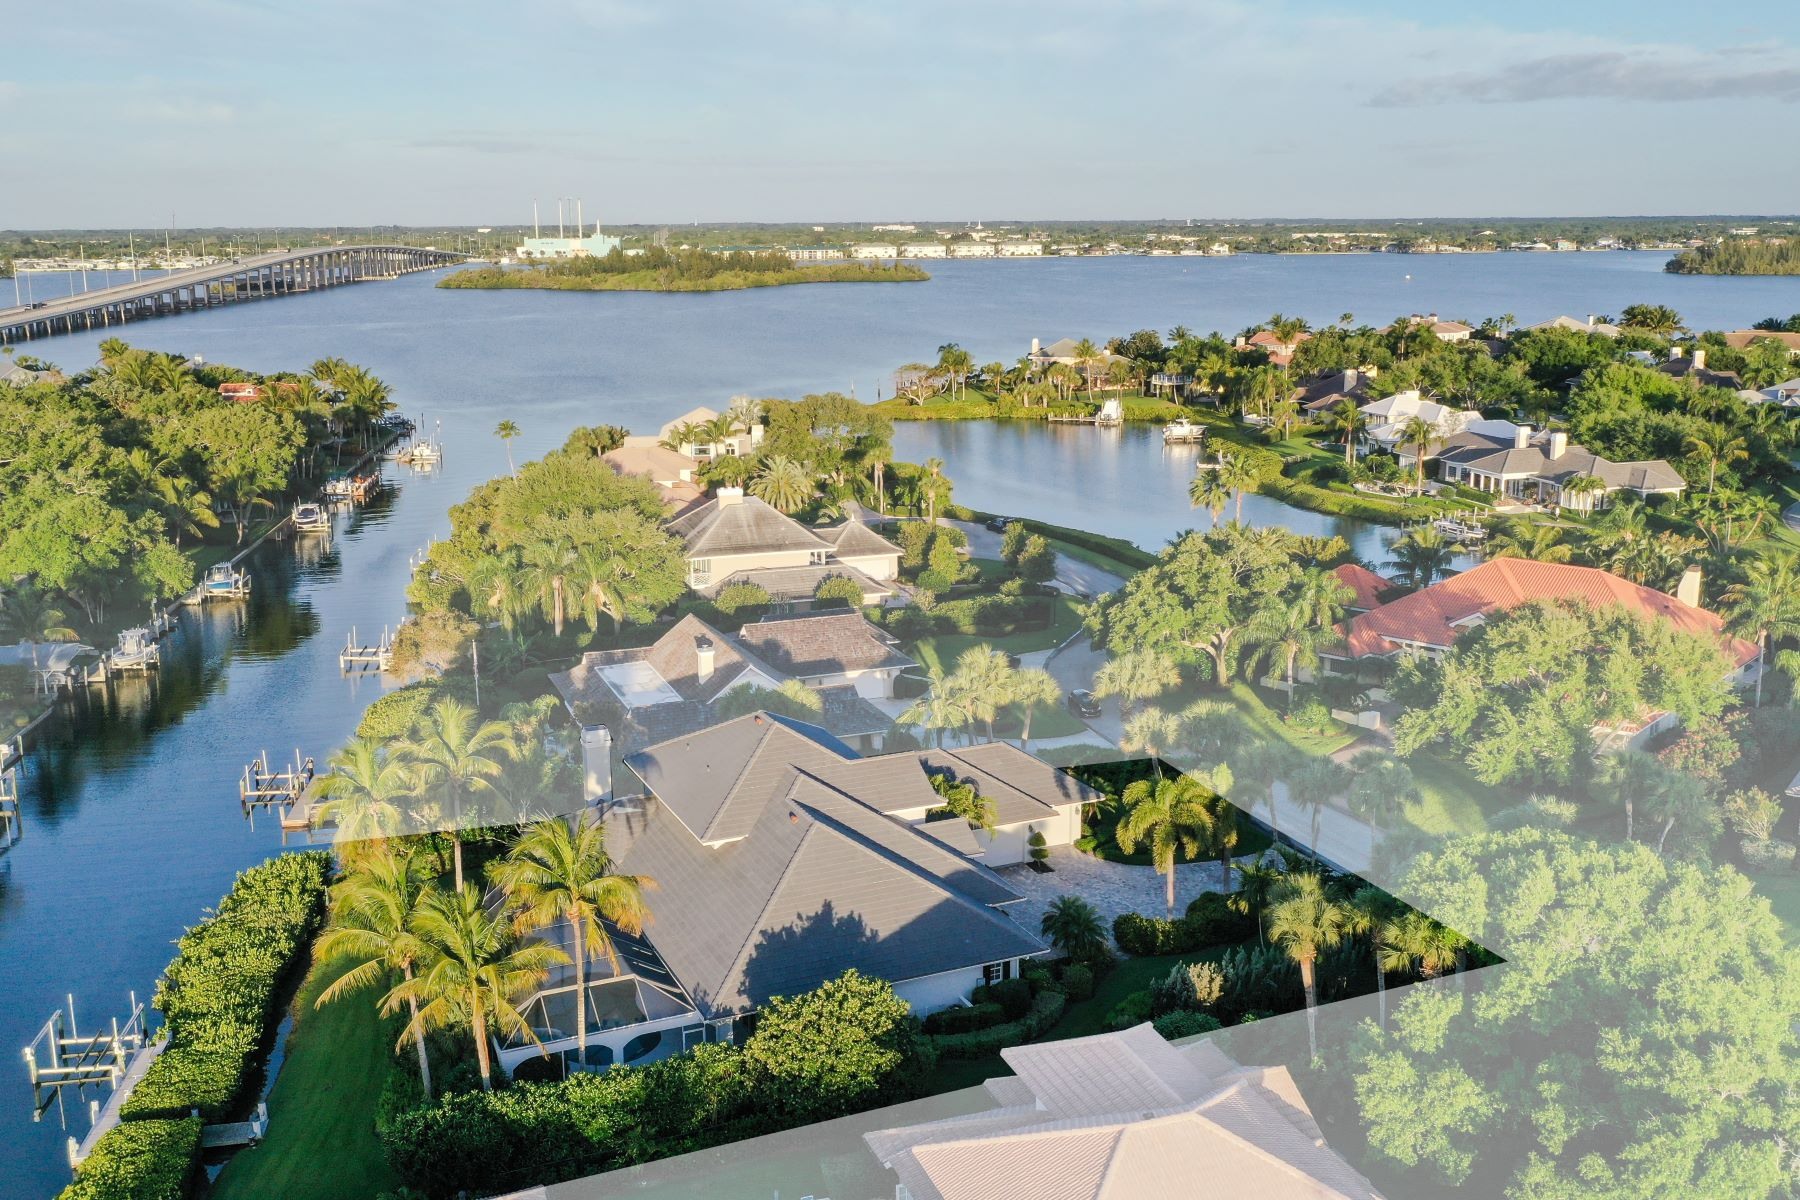 Property for Sale at Riverfront, Pool, Gourmet Kitchen, Three Car Garage 730 Lagoon Road Vero Beach, Florida 32963 United States